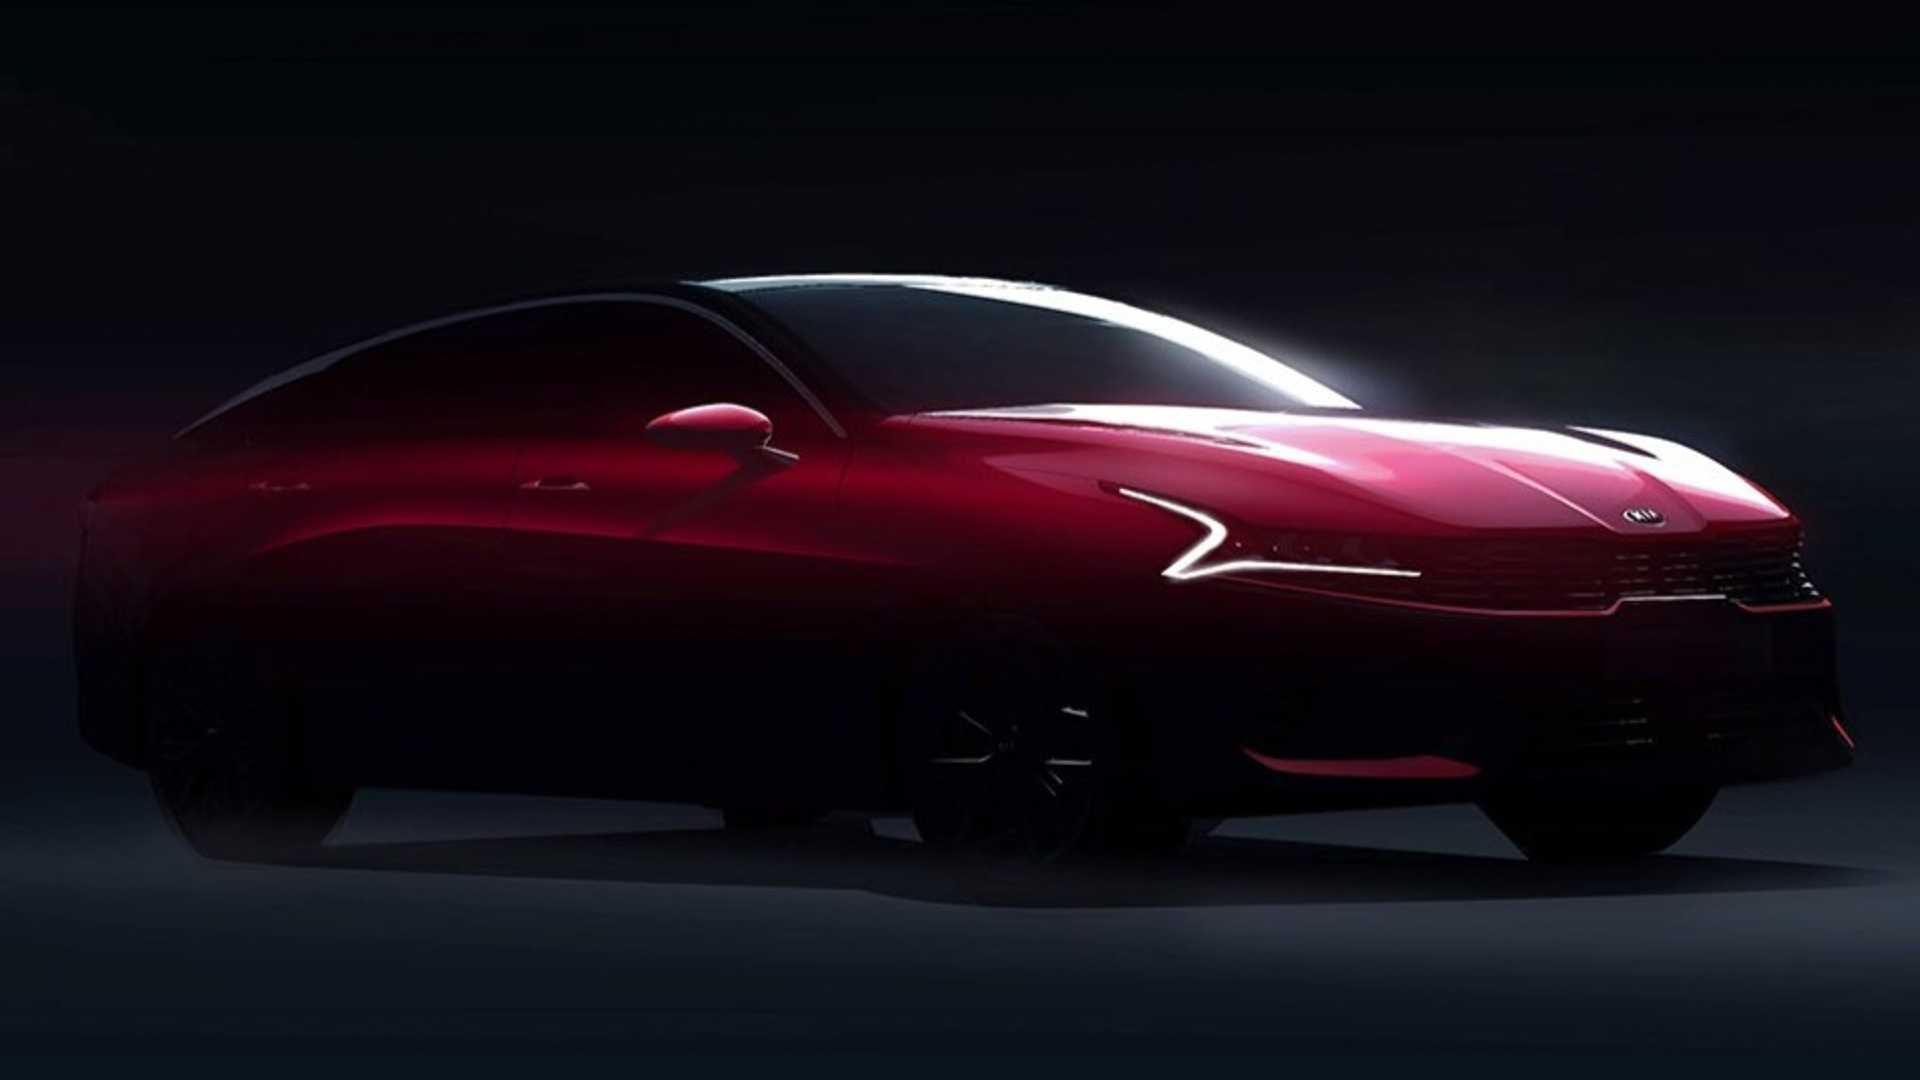 2021 Kia Optima Sedan Teased Could It Come To India Zigwheels